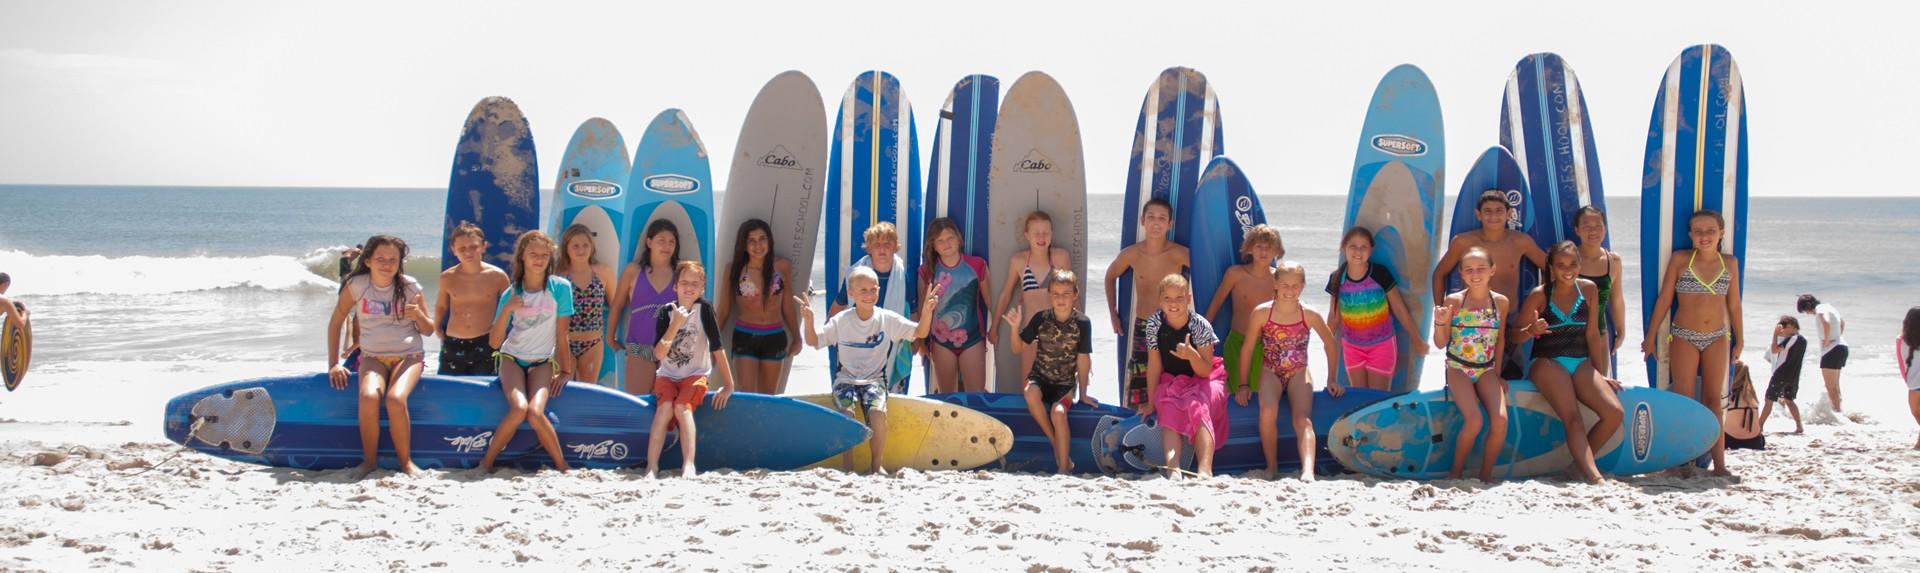 Coastline Adventures Surfing School